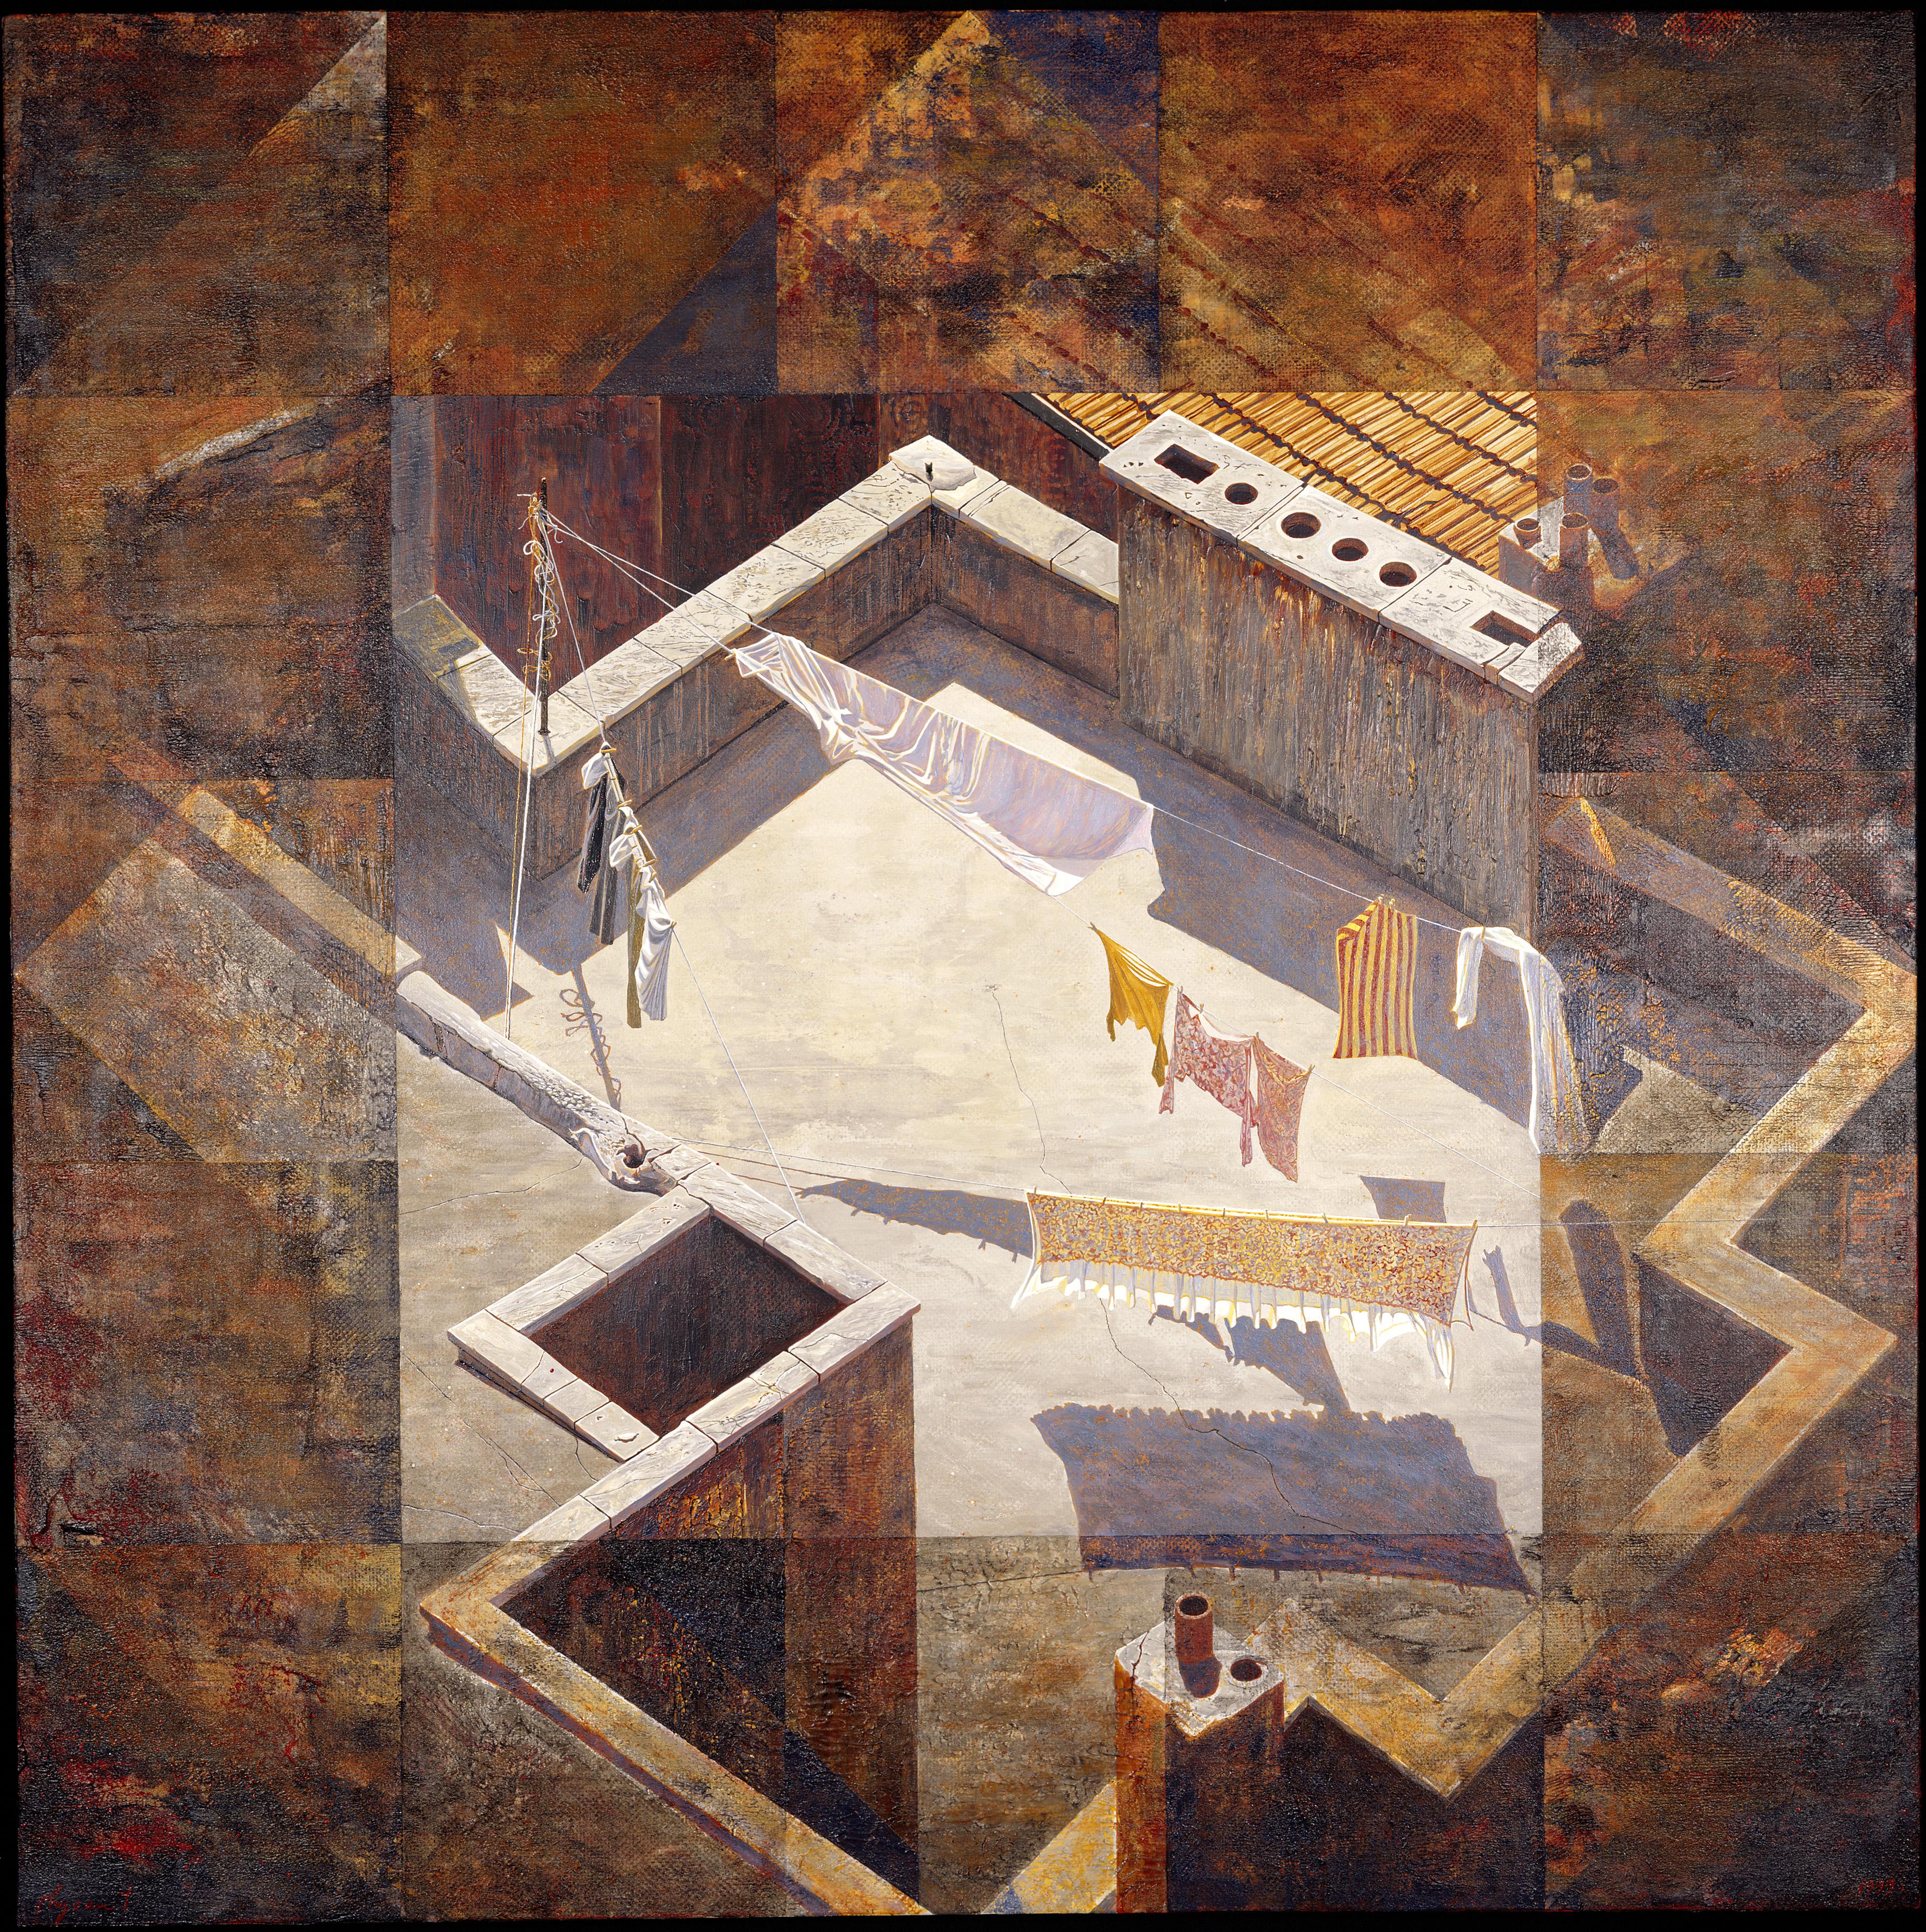 Højde, bredde, dybde og transcendens, 1999 (100×100 cm)